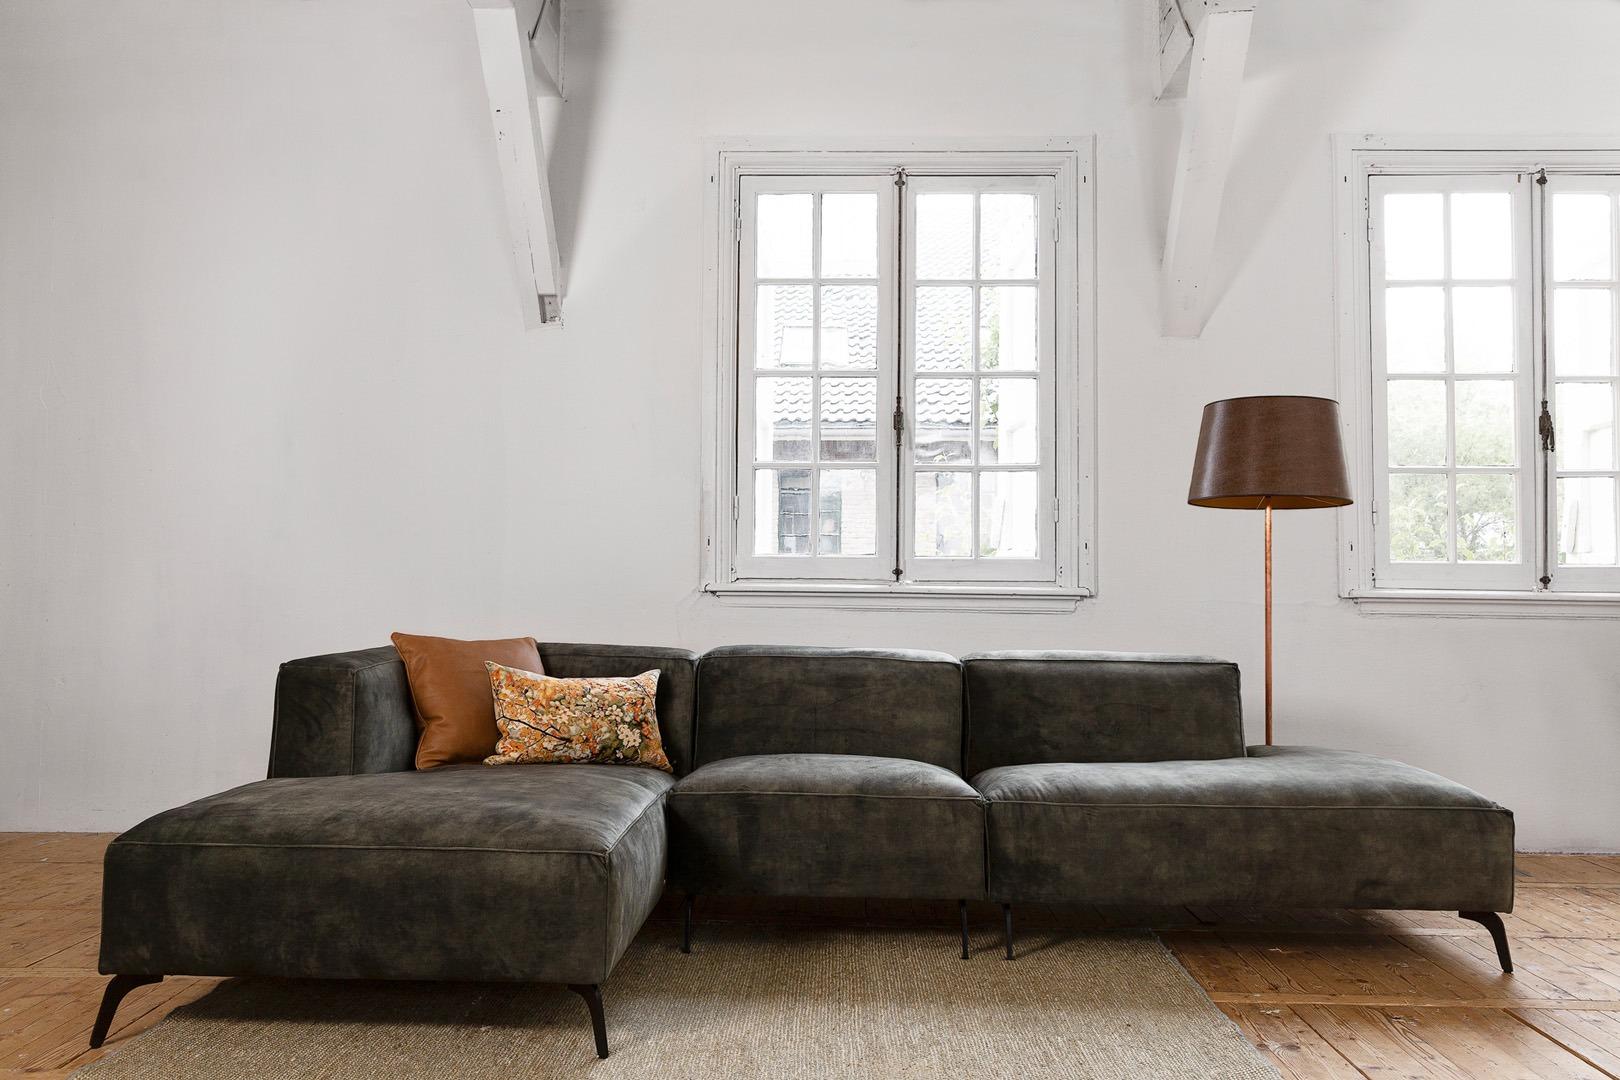 vino-piemonte-hoekbank-longchair-ottoman-terminal-groen-stof-3 (1)